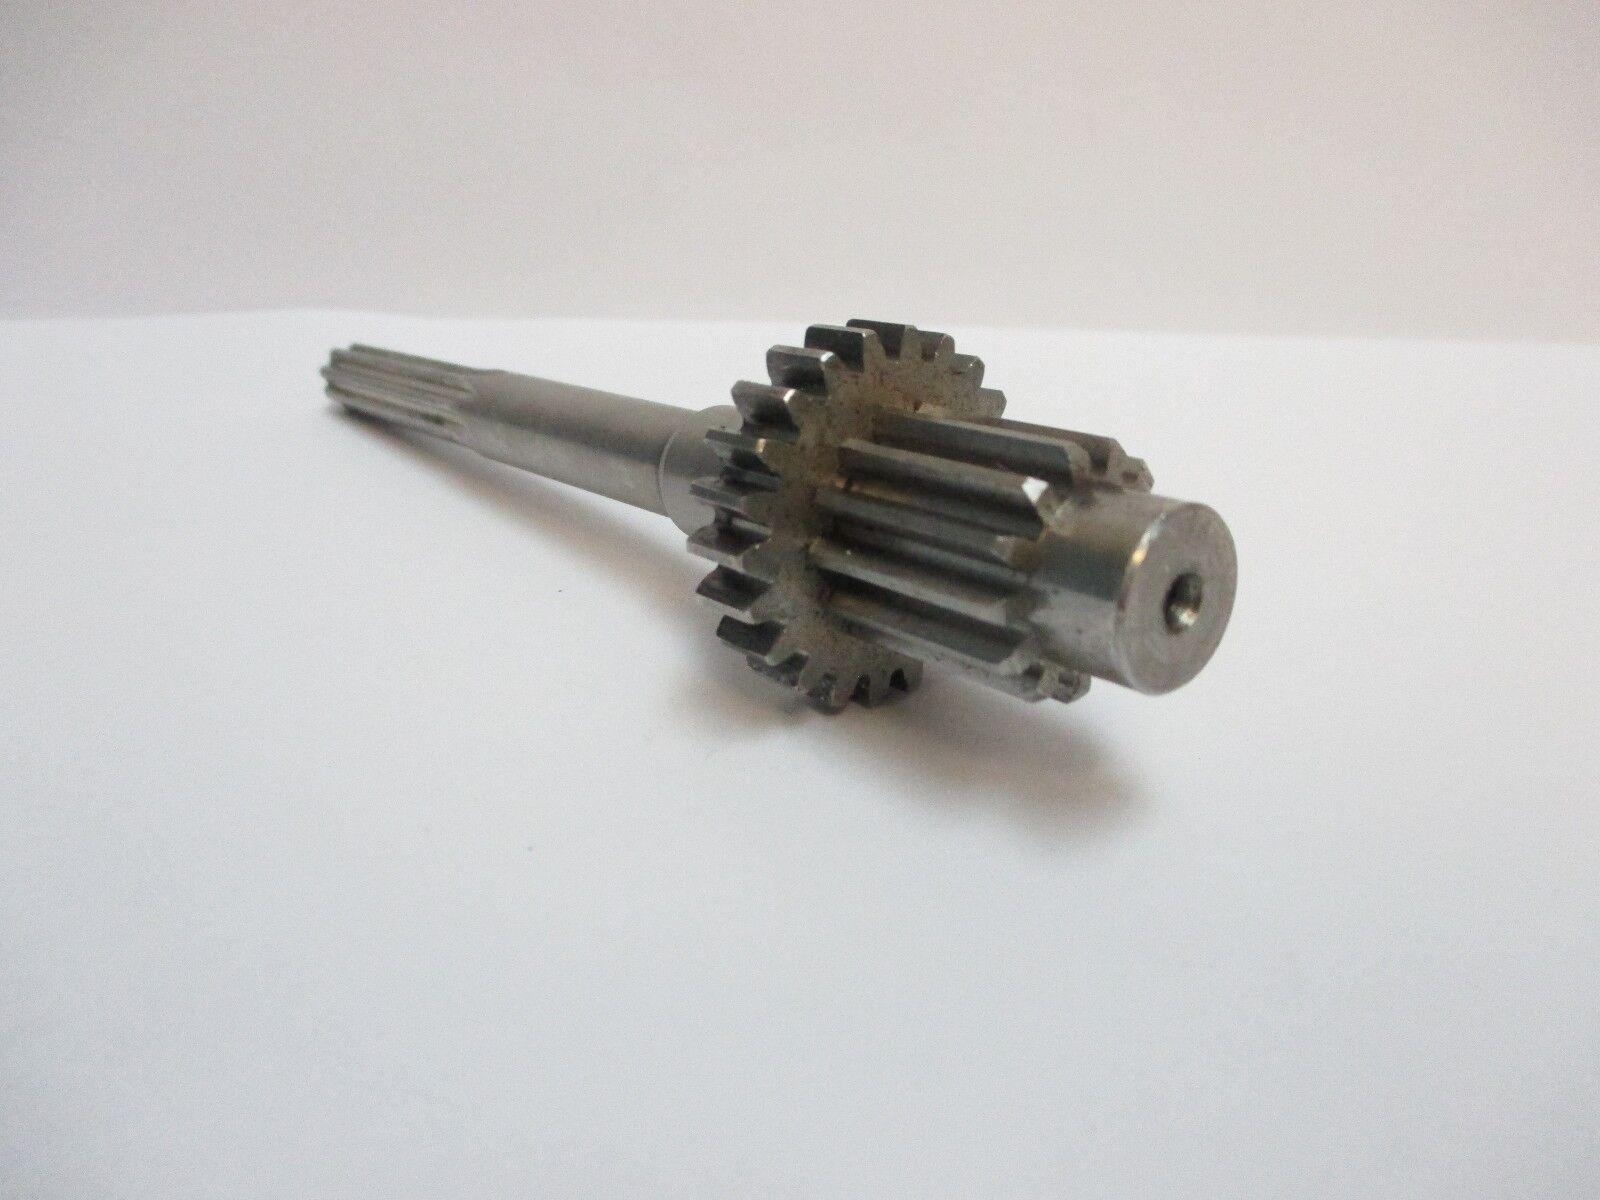 PENN BIG GAME REEL PART - 13-80ST International 80ST 2-Speed - Pinion Gear